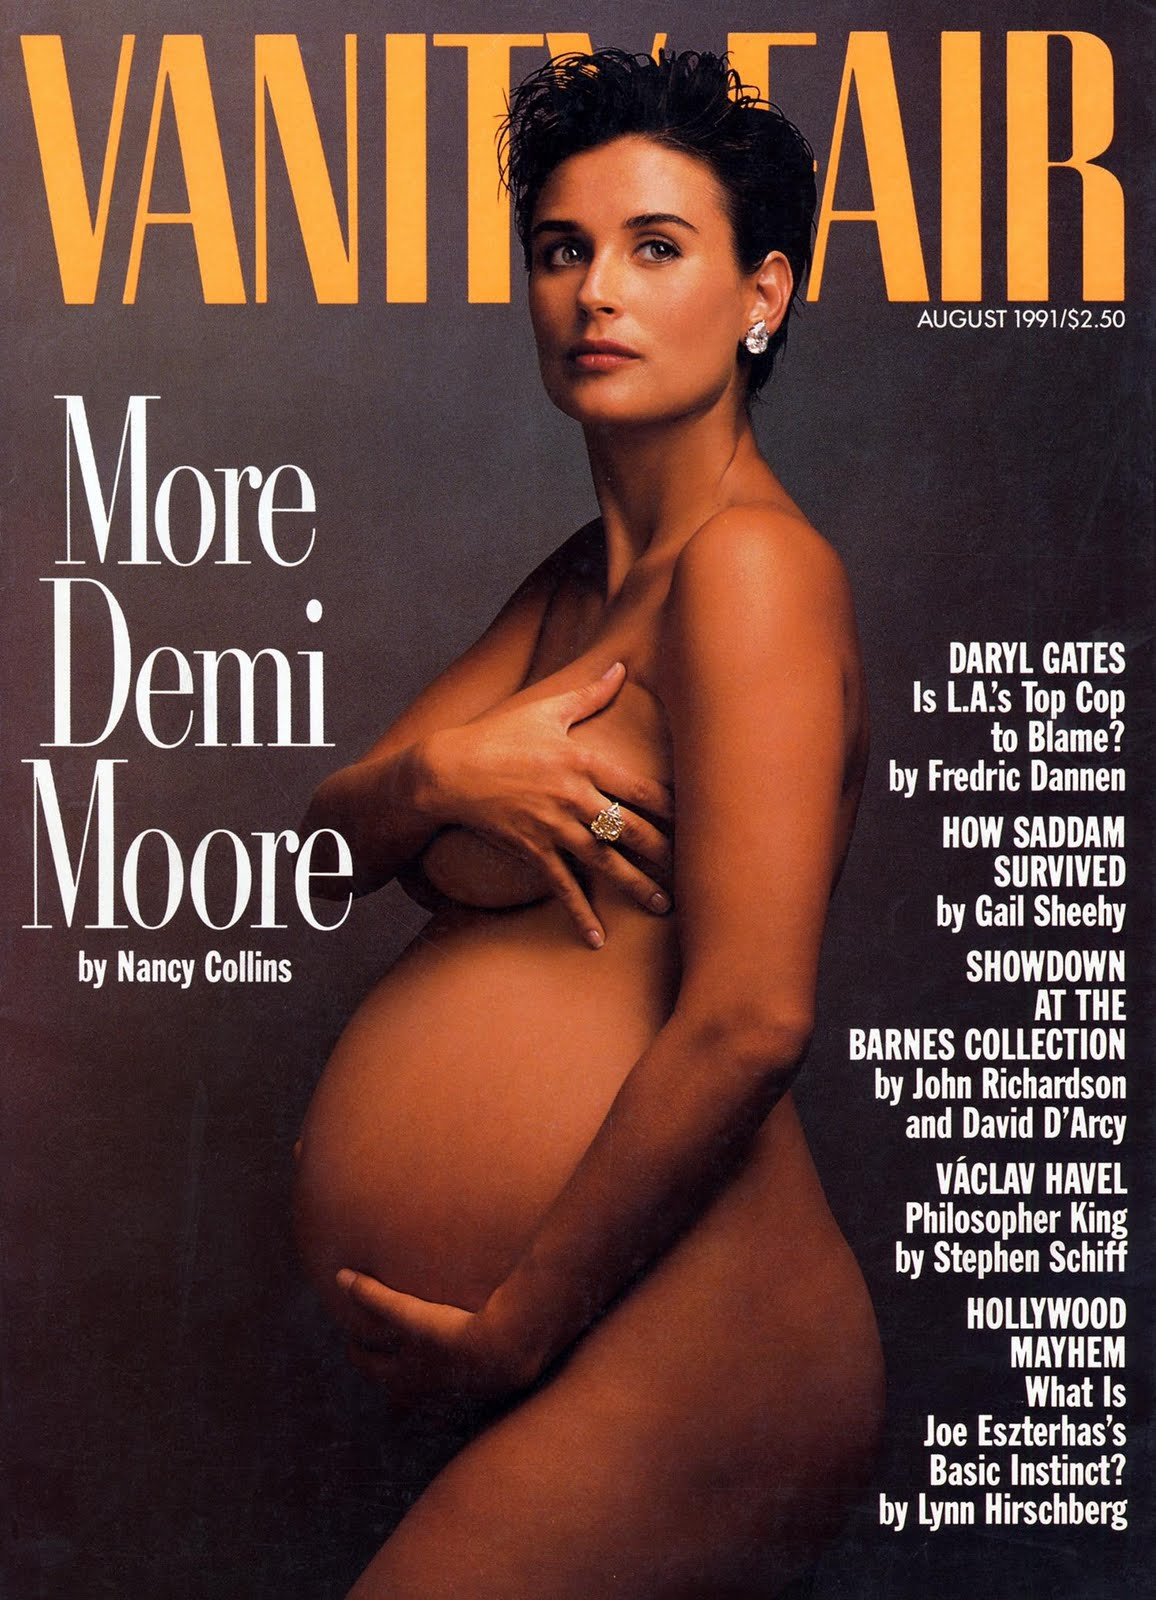 http://4.bp.blogspot.com/-yv7v4FL5WA4/T94JiZ13UPI/AAAAAAAAA9k/iz_Q6shsyu4/s1600/annie-leibovitz-demi-moore-nude-pregnant-vanity-fair-august-1991-cover-portrait.jpg